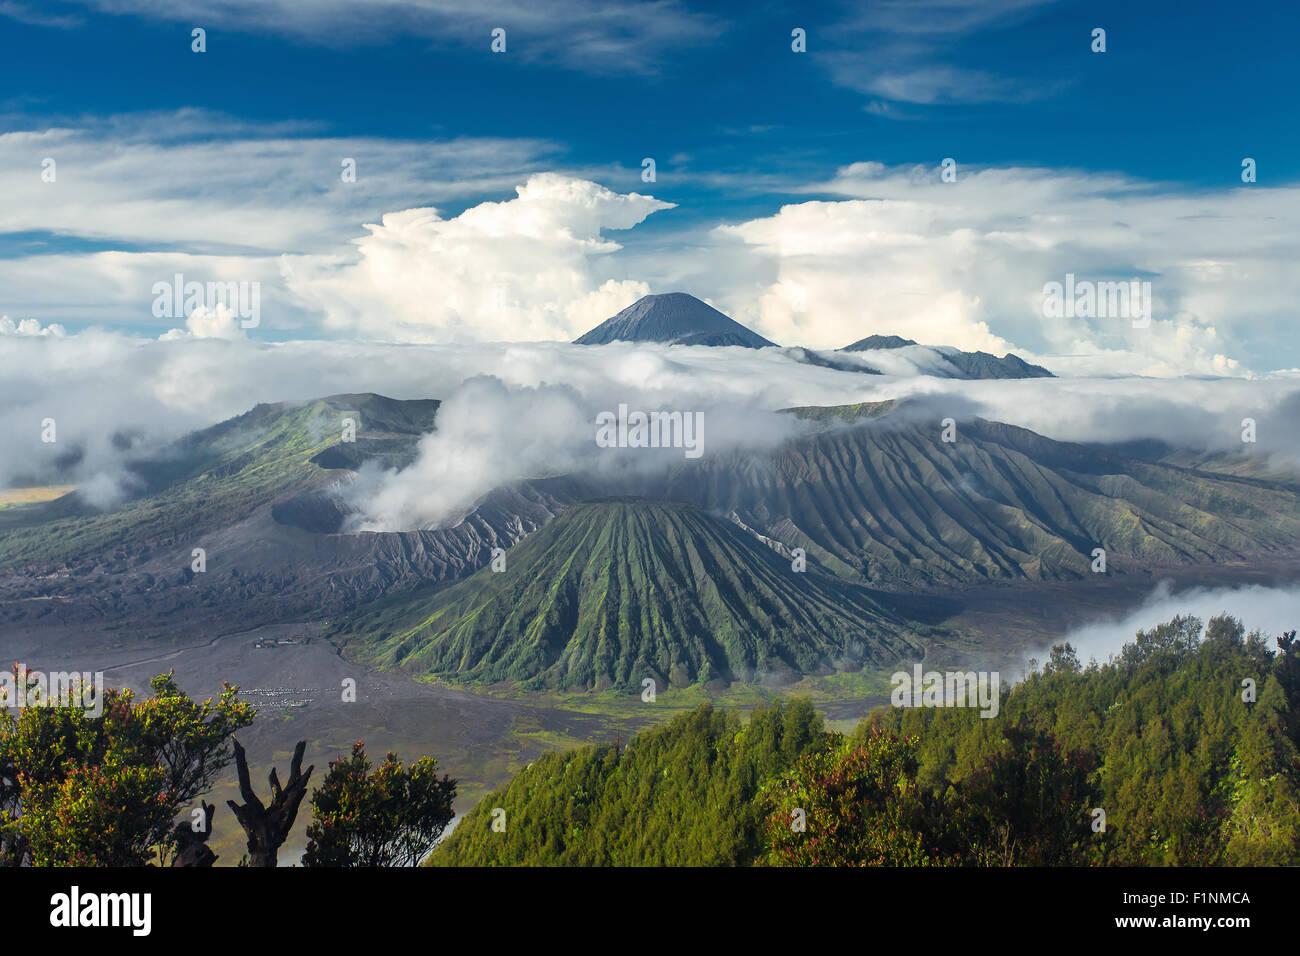 Mount Bromo and Batok volcanoes in Bromo Tengger Semeru National Park, East Java, Indonesia. - Stock Image